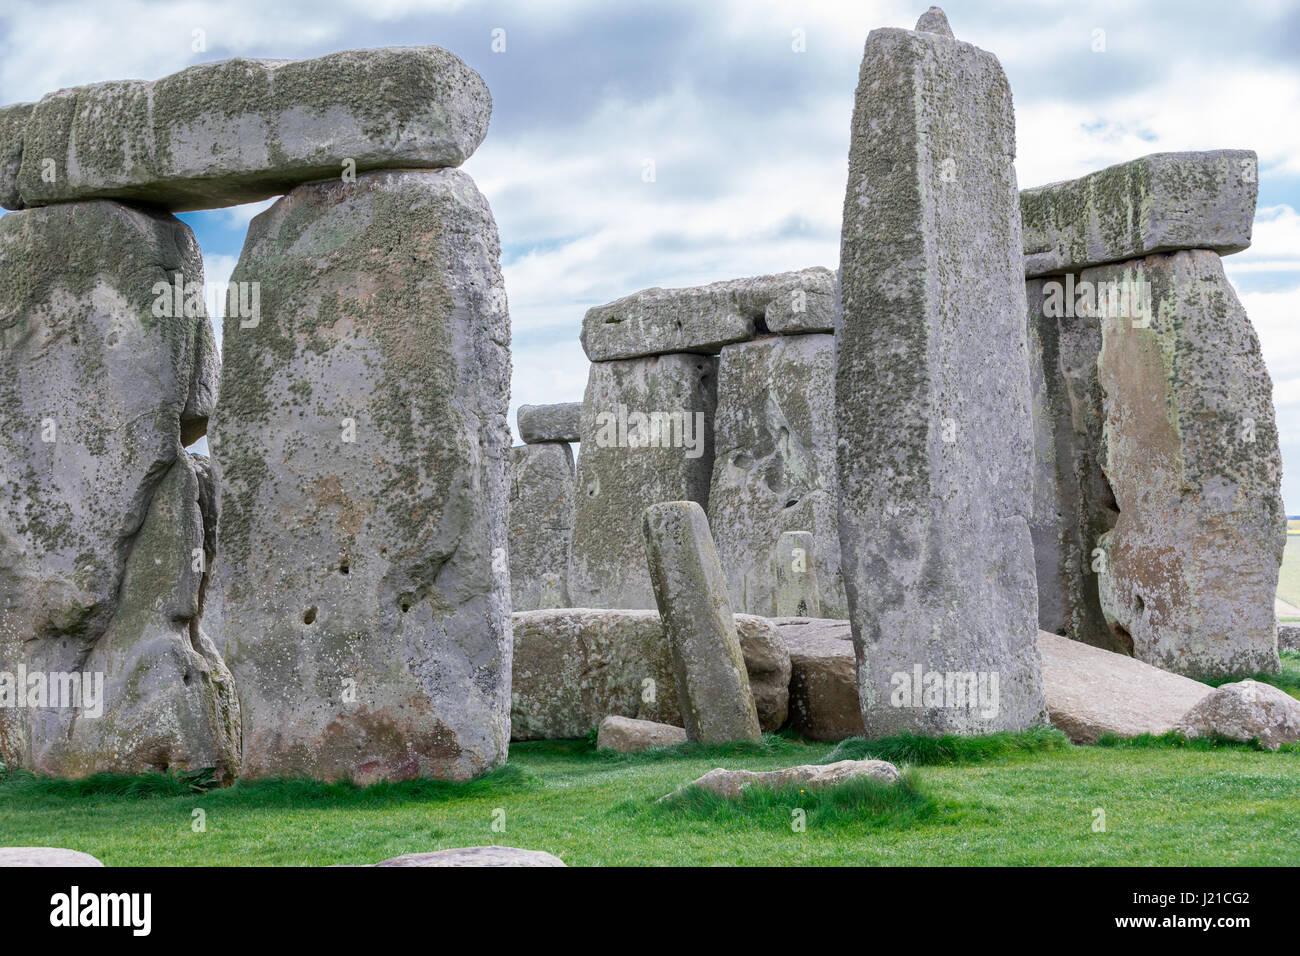 Detail images of Stonehenge - Stock Image